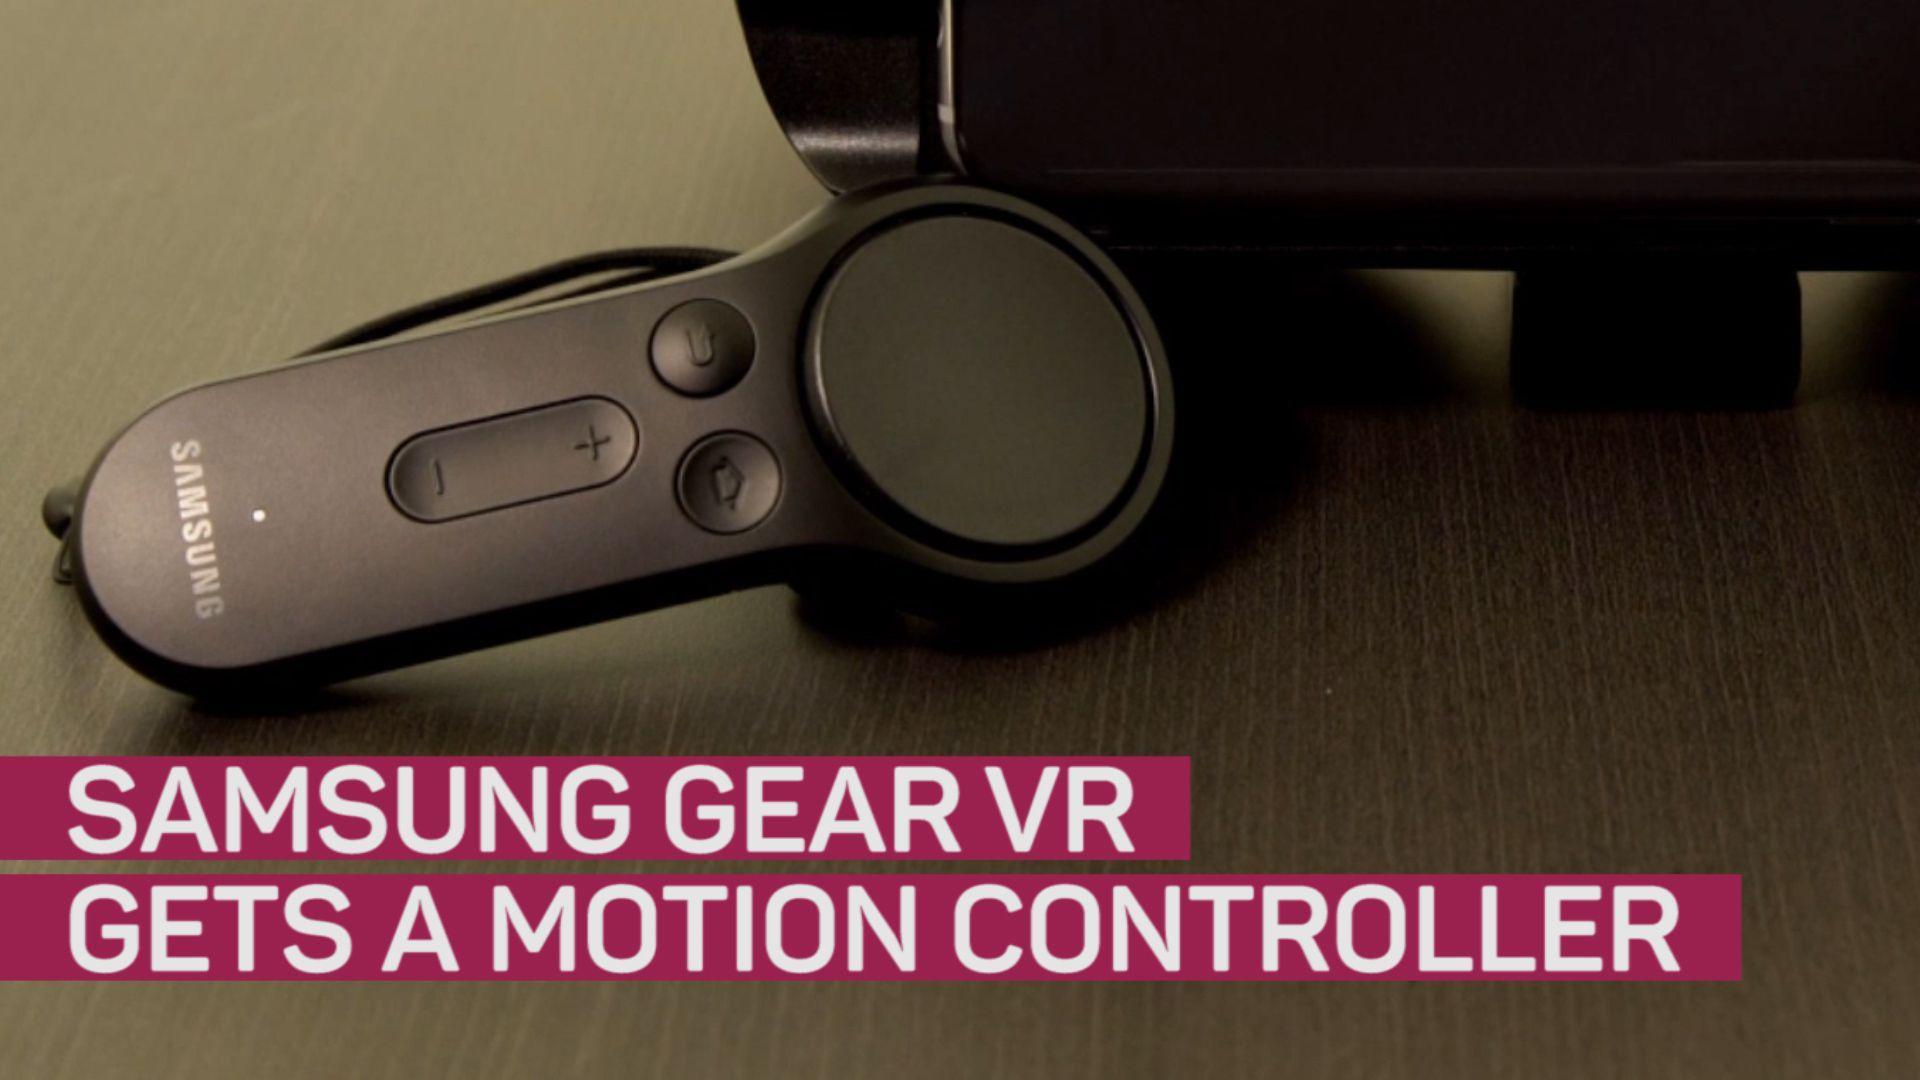 Samsung Gear VR gets a motion controlling sensor